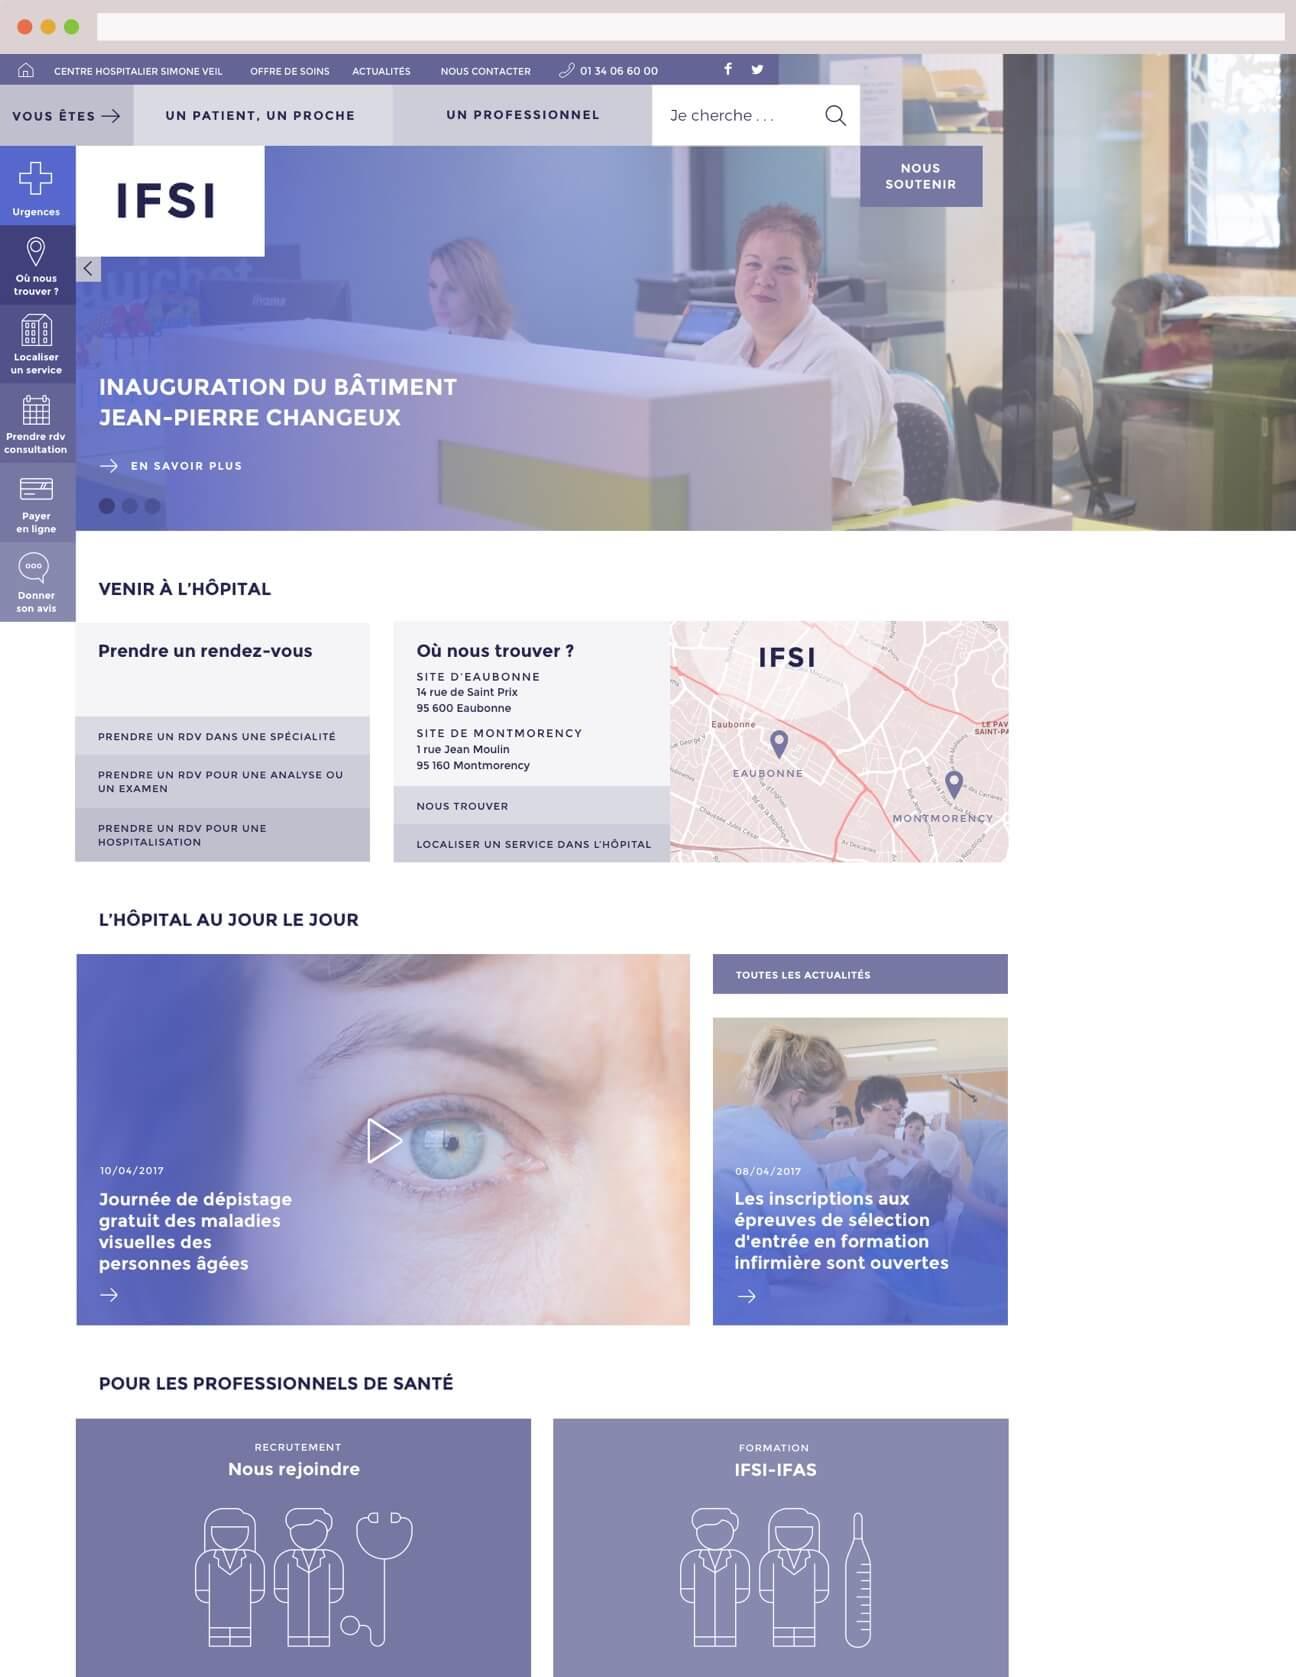 Webdesign hôpital : variante bleue école infirmières